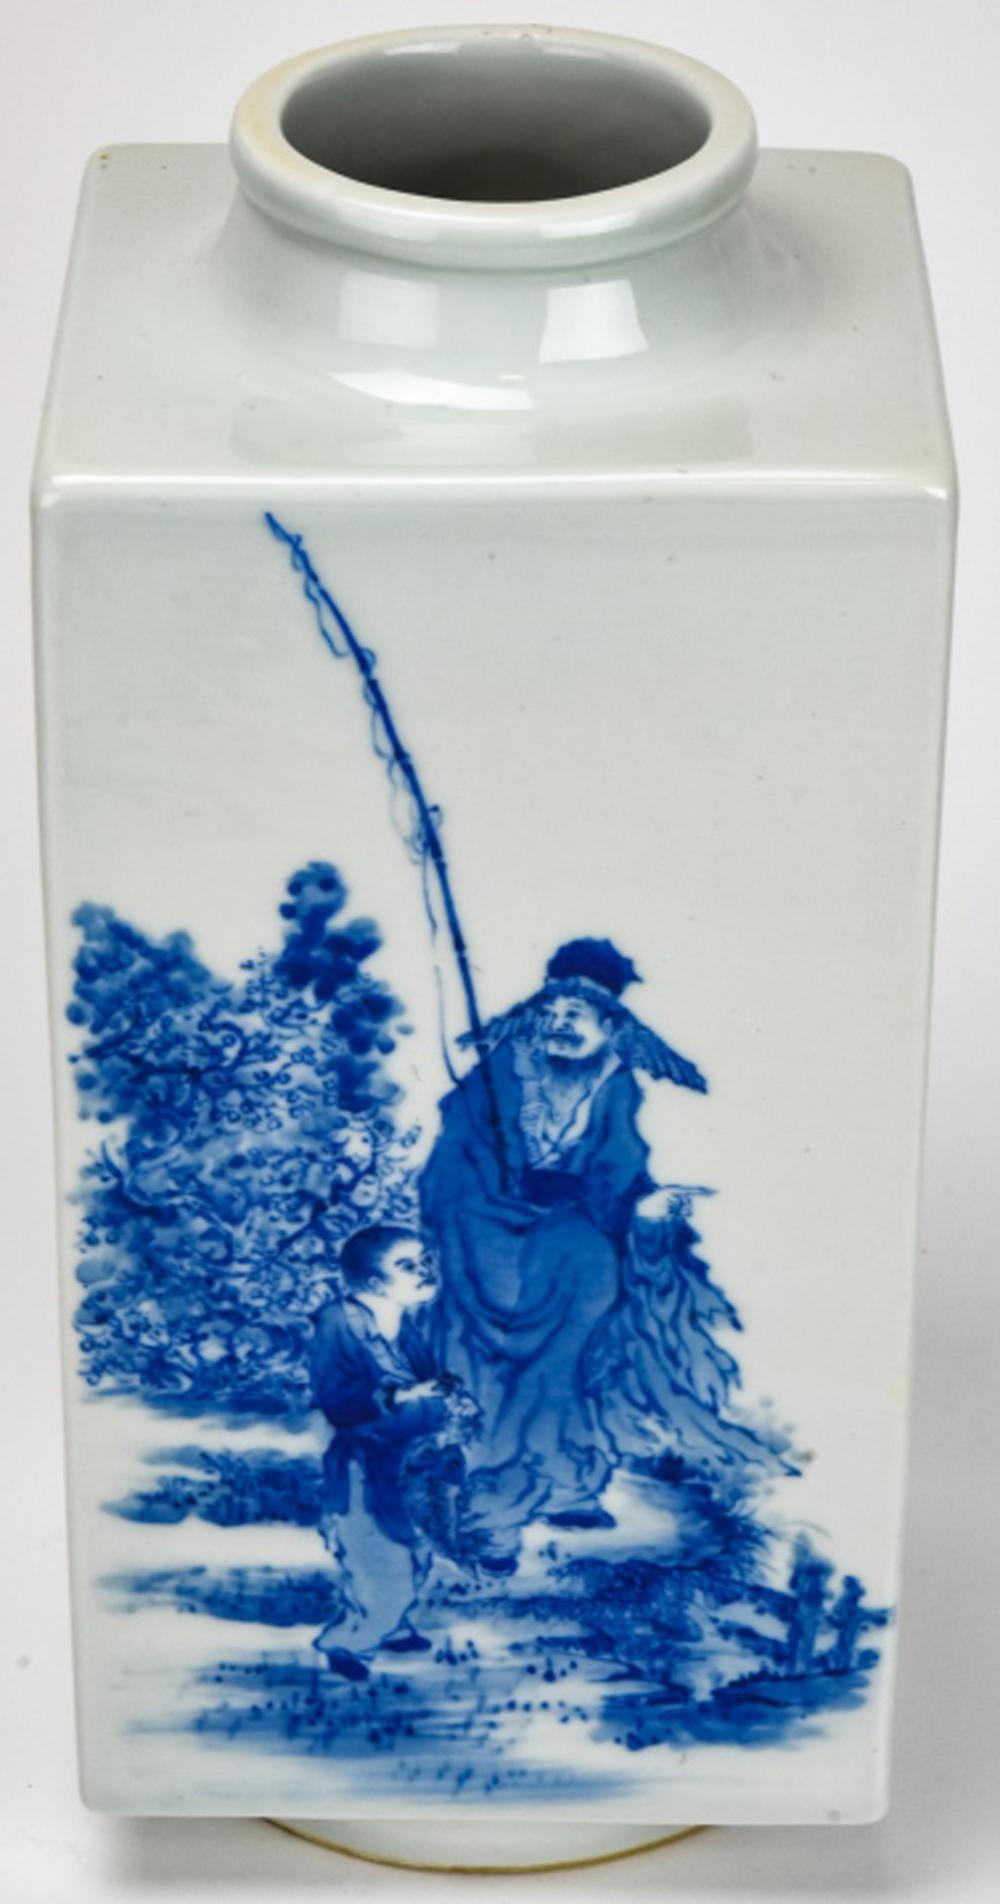 Chinese Blue & White Porcelain Square Form Vase